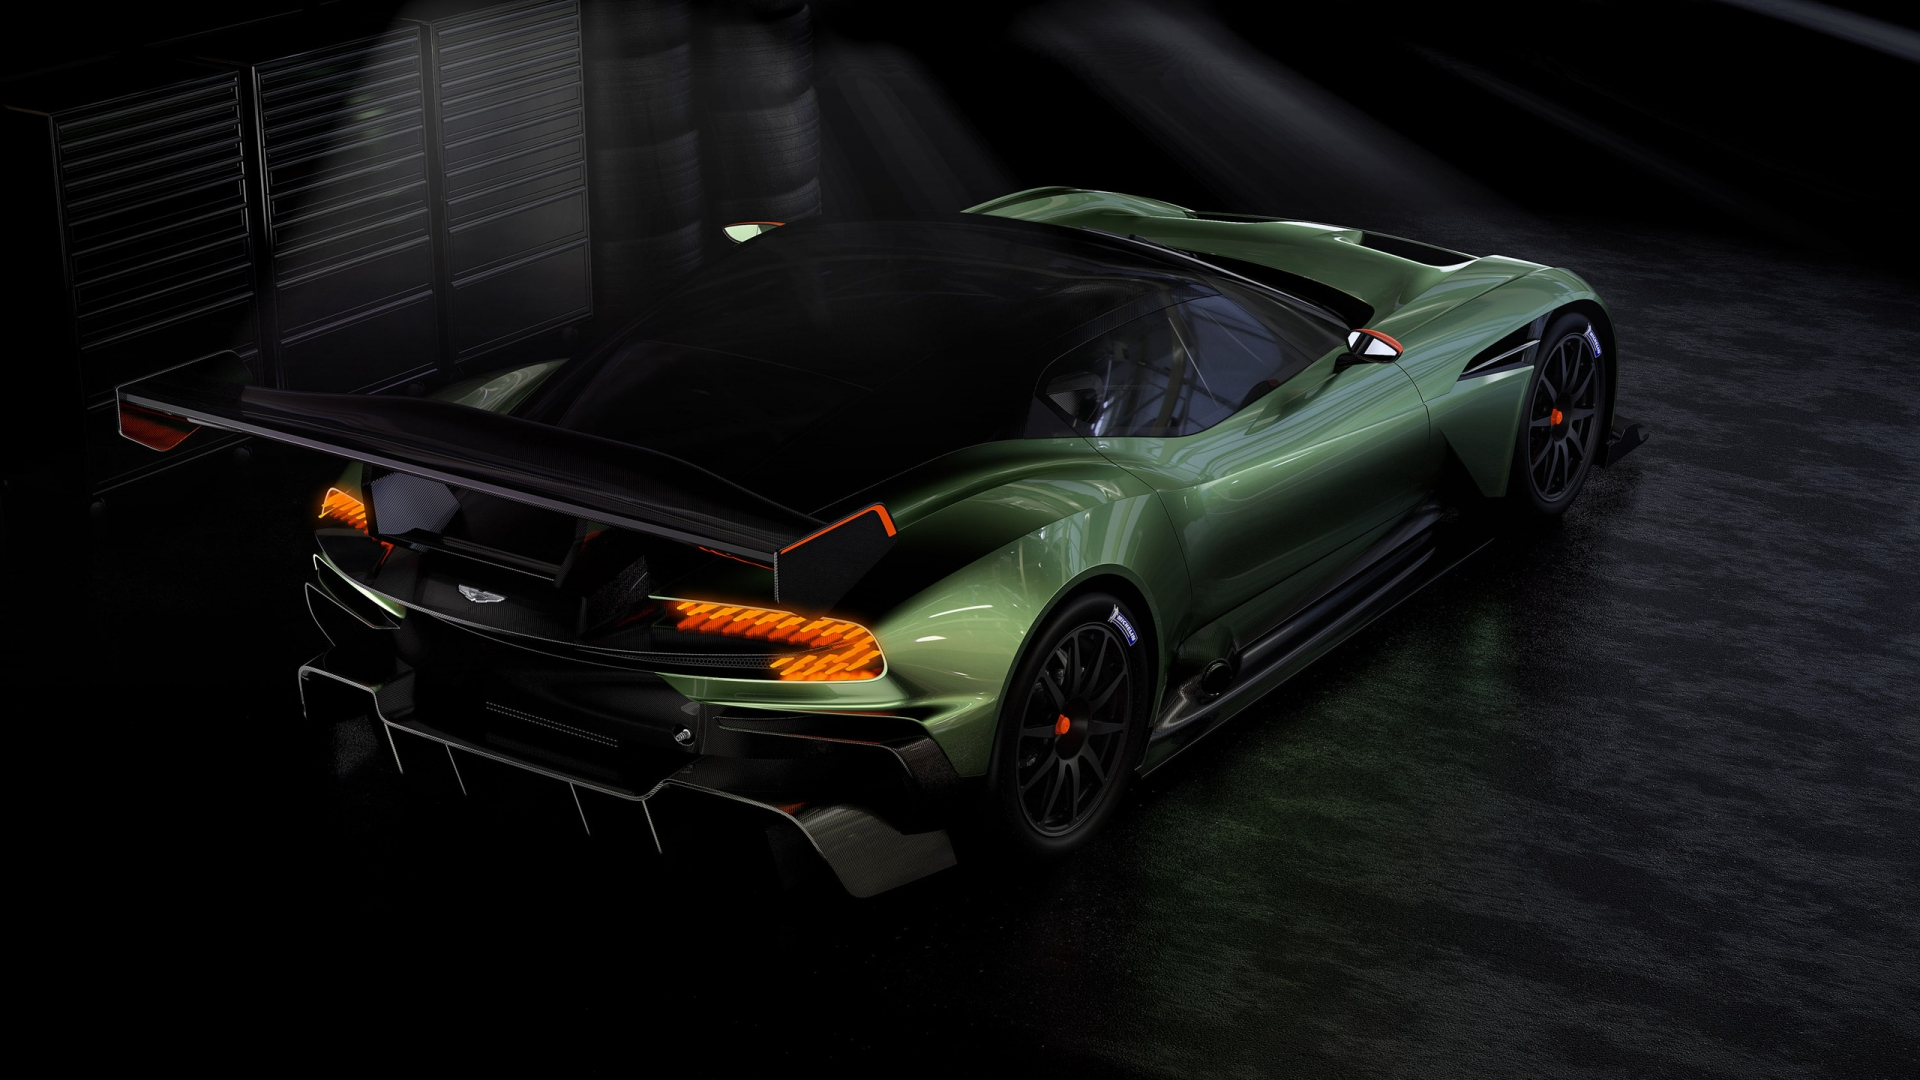 Aston Martin Vulcan суперкар бесплатно